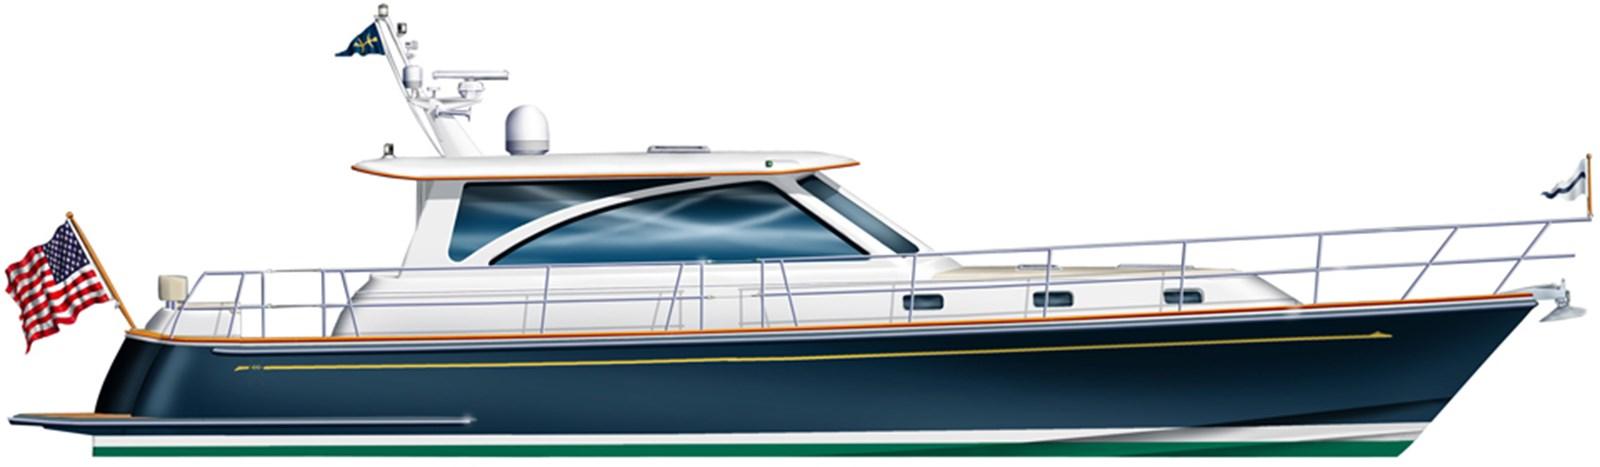 hunt-52-layout-2 2010 HUNT YACHTS Hunt 52 Motor Yacht 2852267